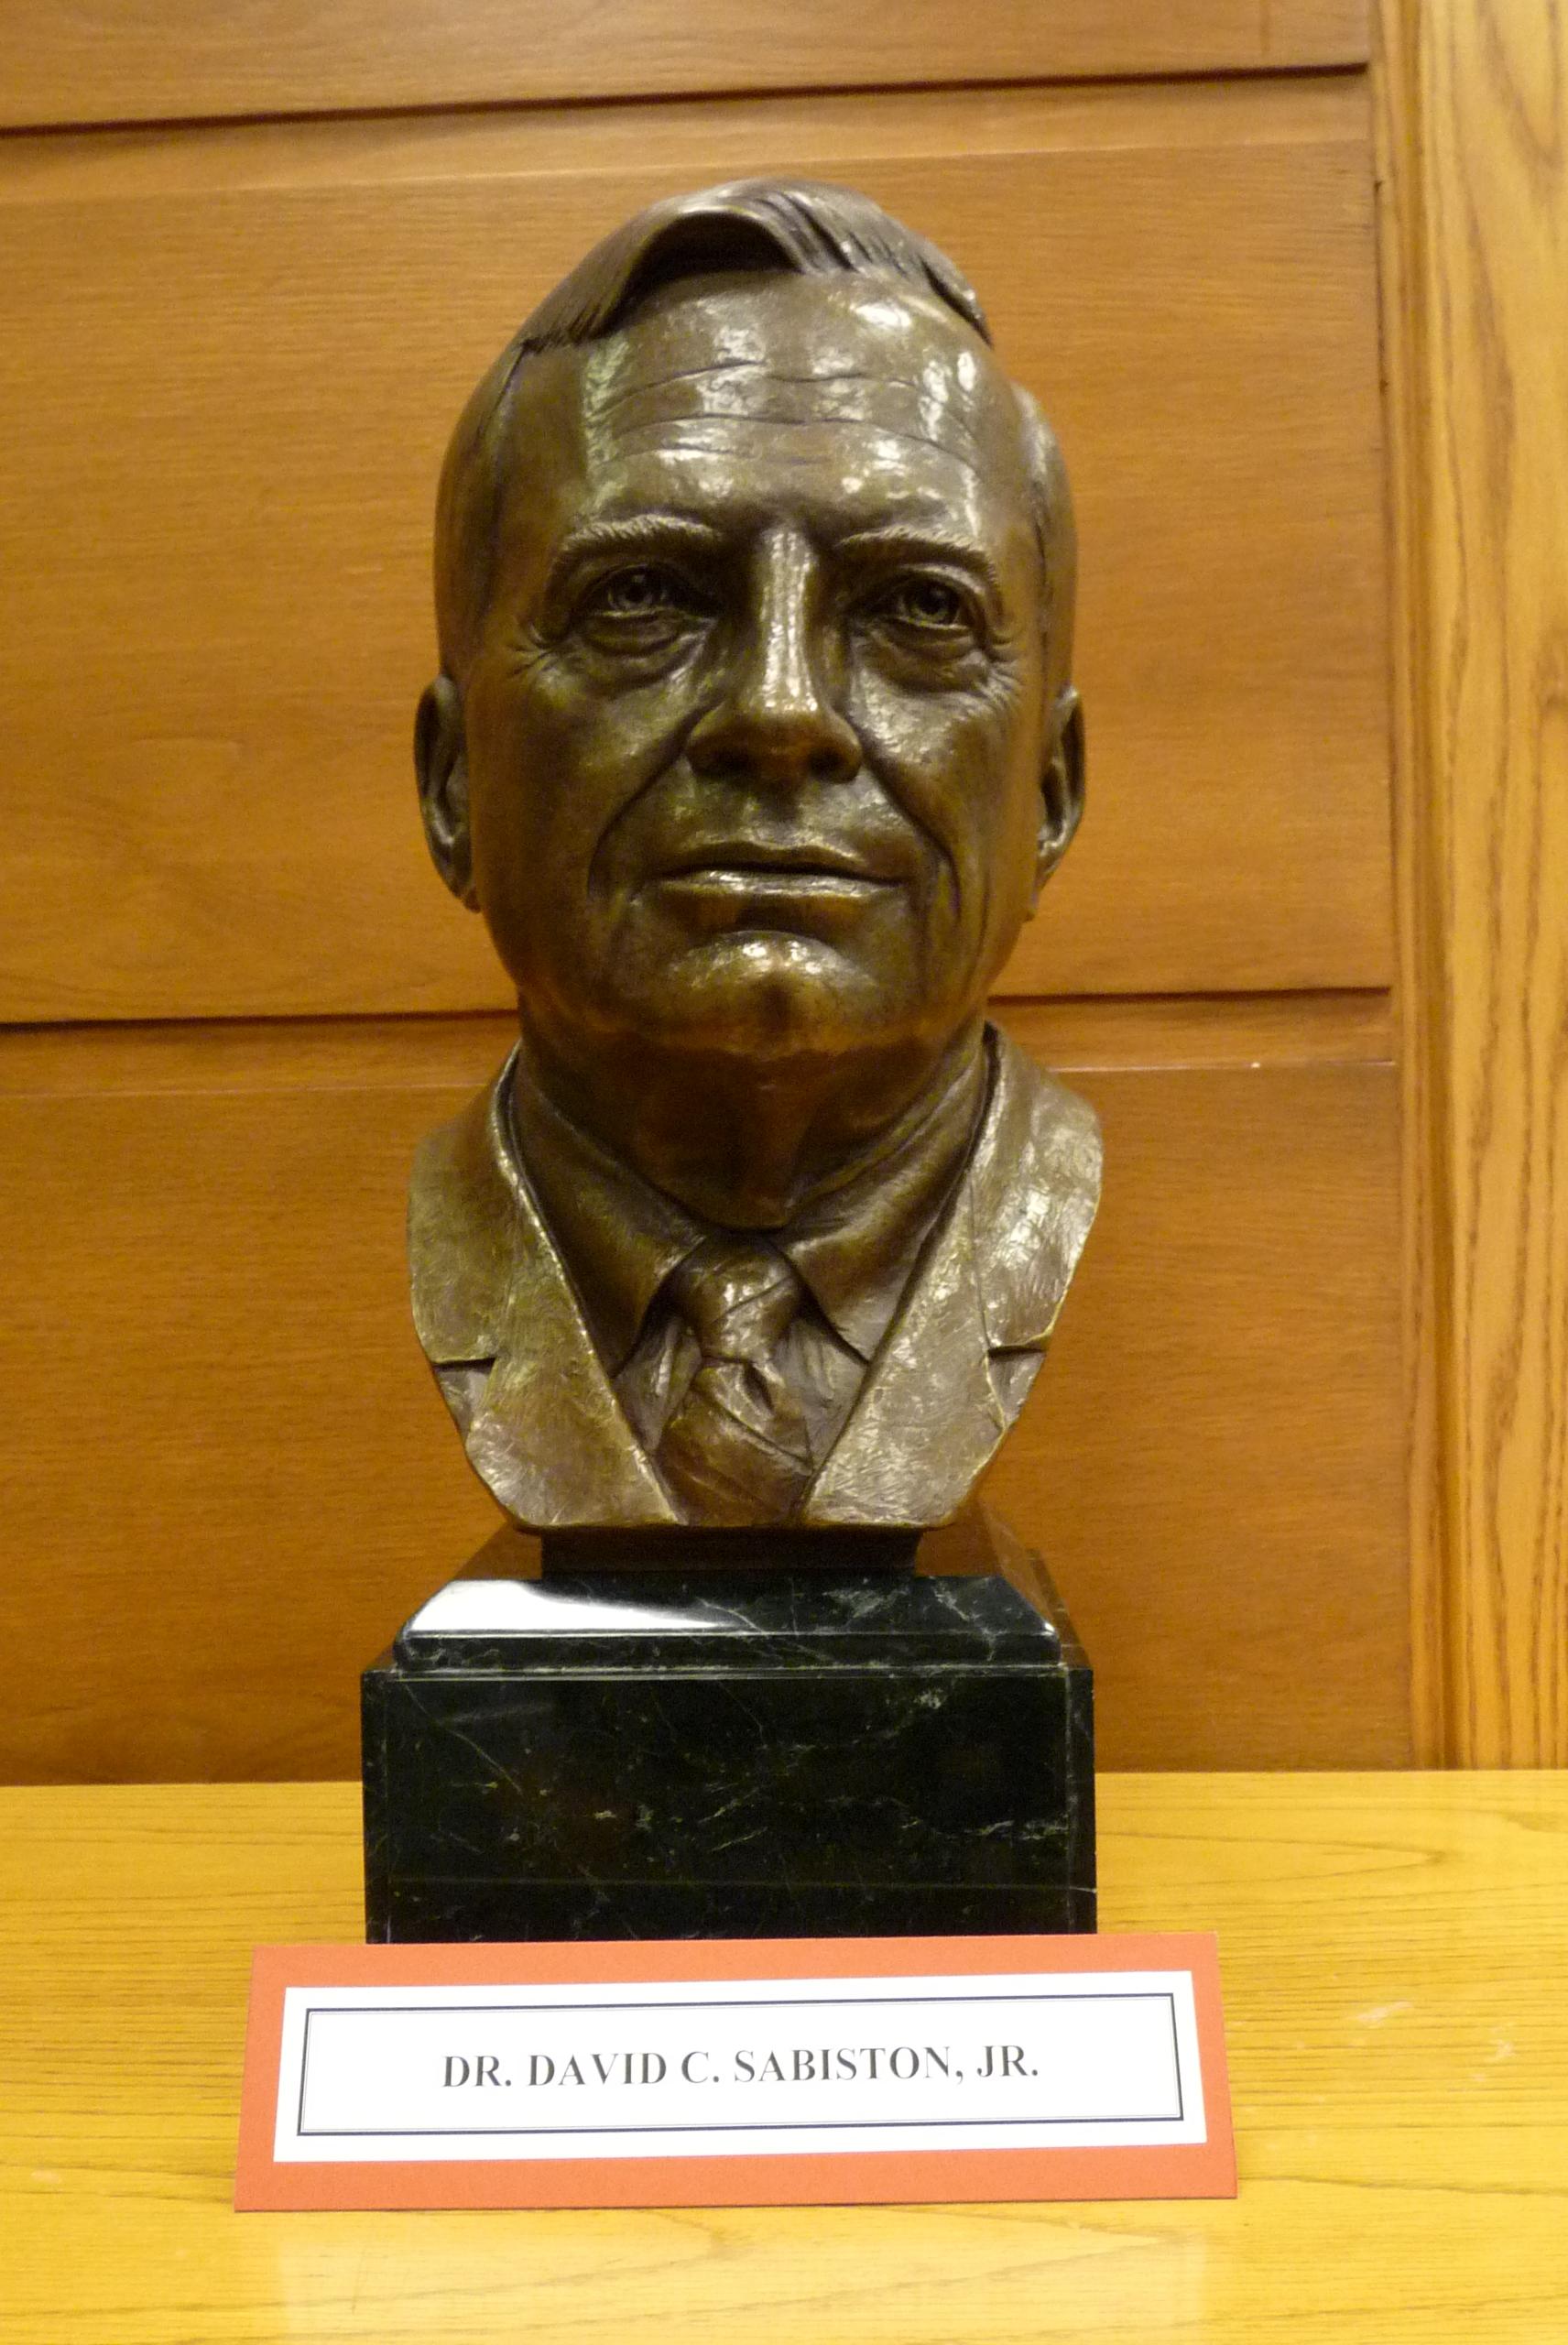 Sabiston bust